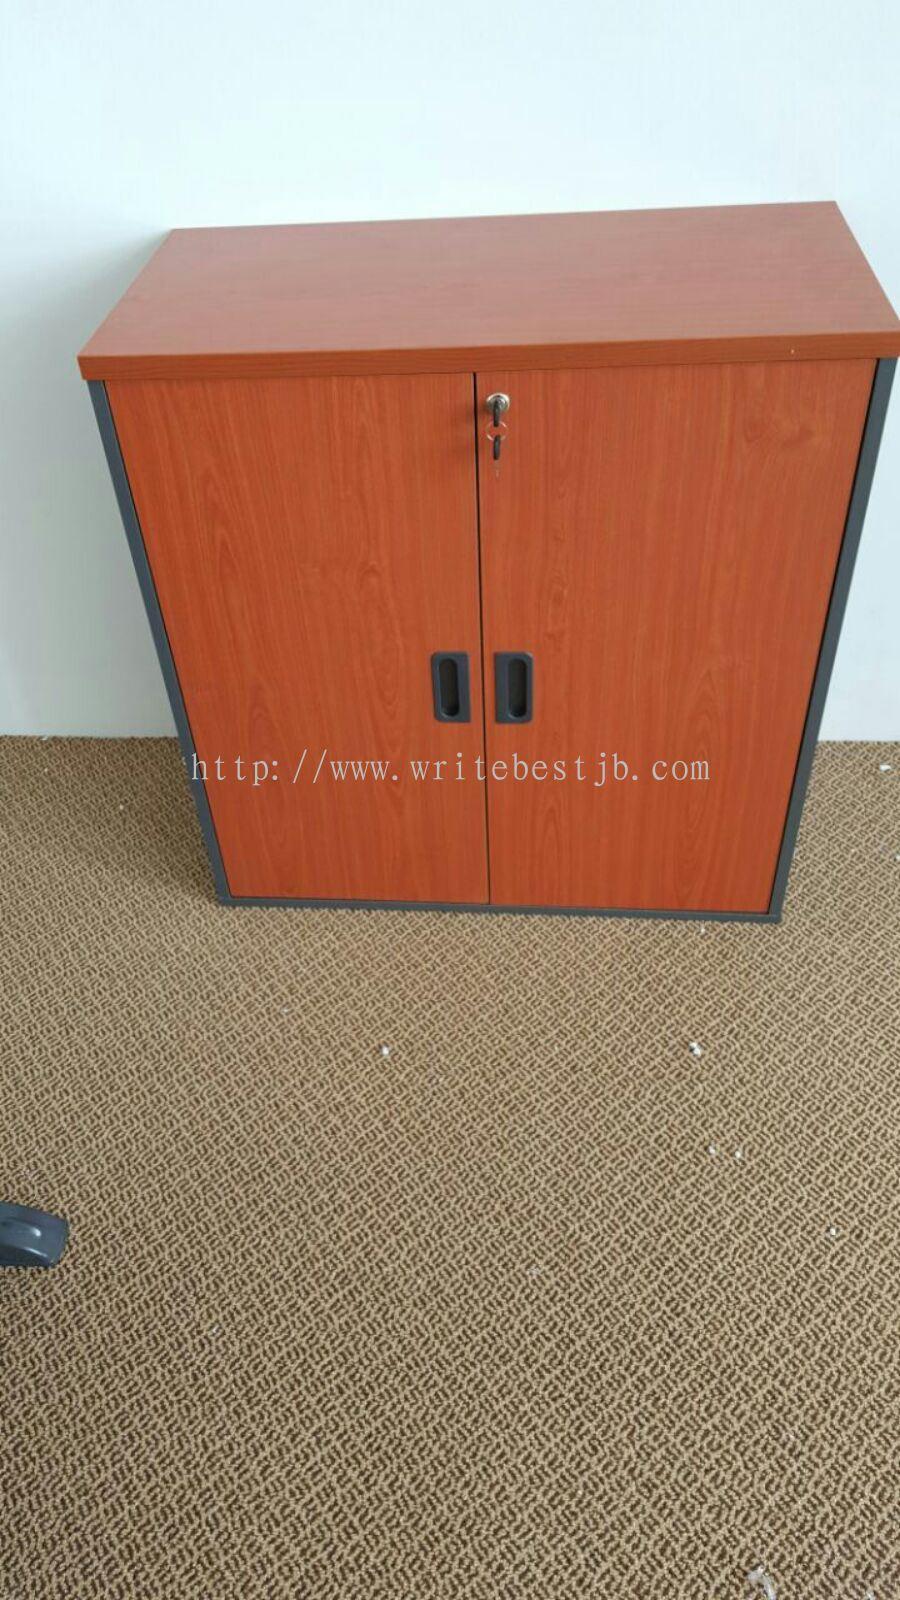 Johor Bahru Jb Office Furniture Office Furniture System From Writebest Jb Sdn Bhd